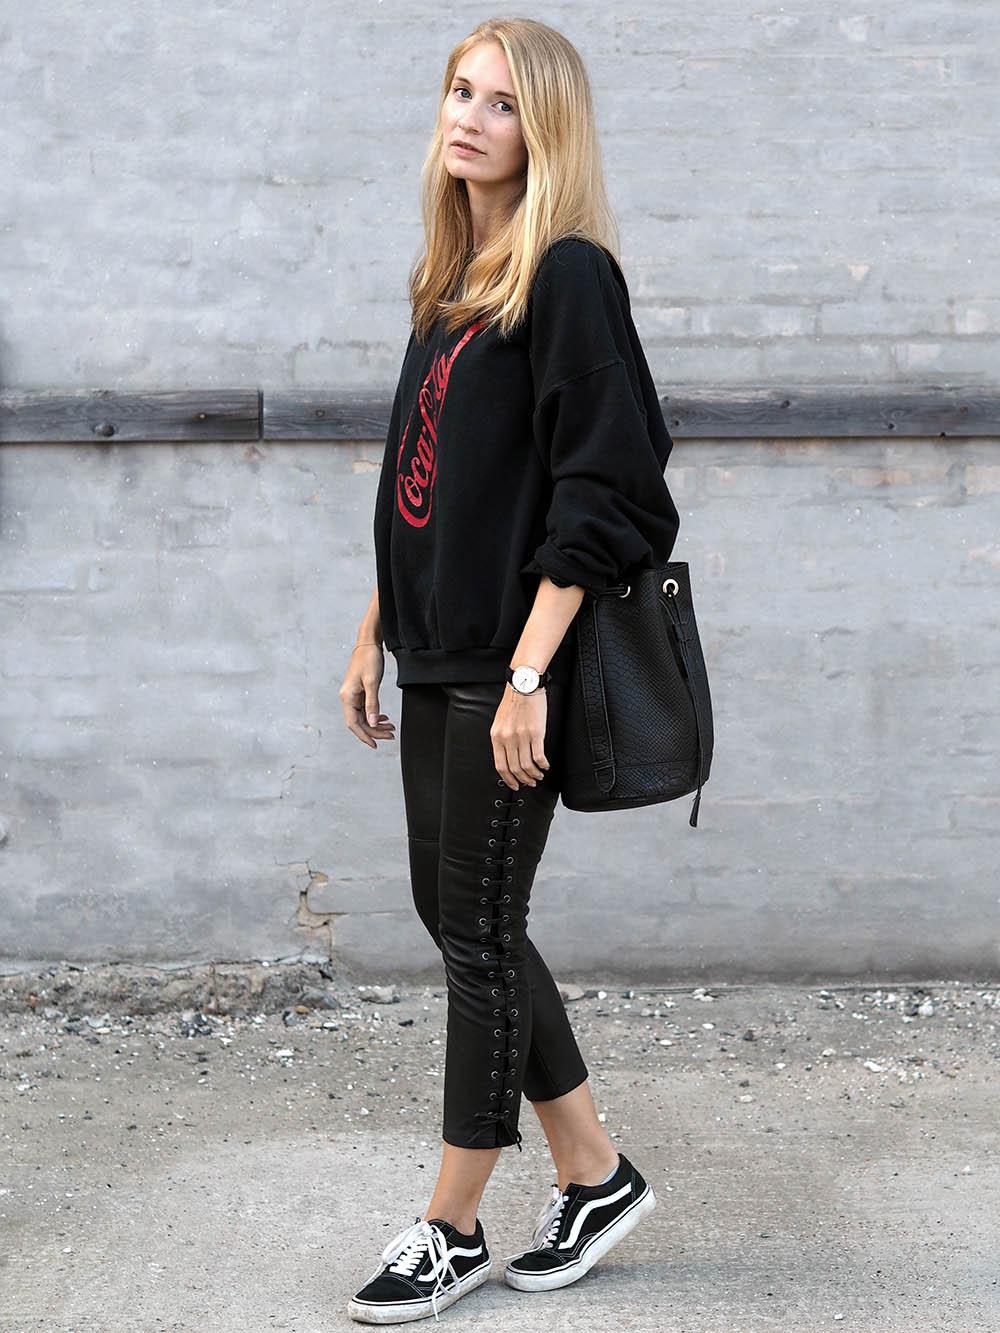 h&m marant leather pants